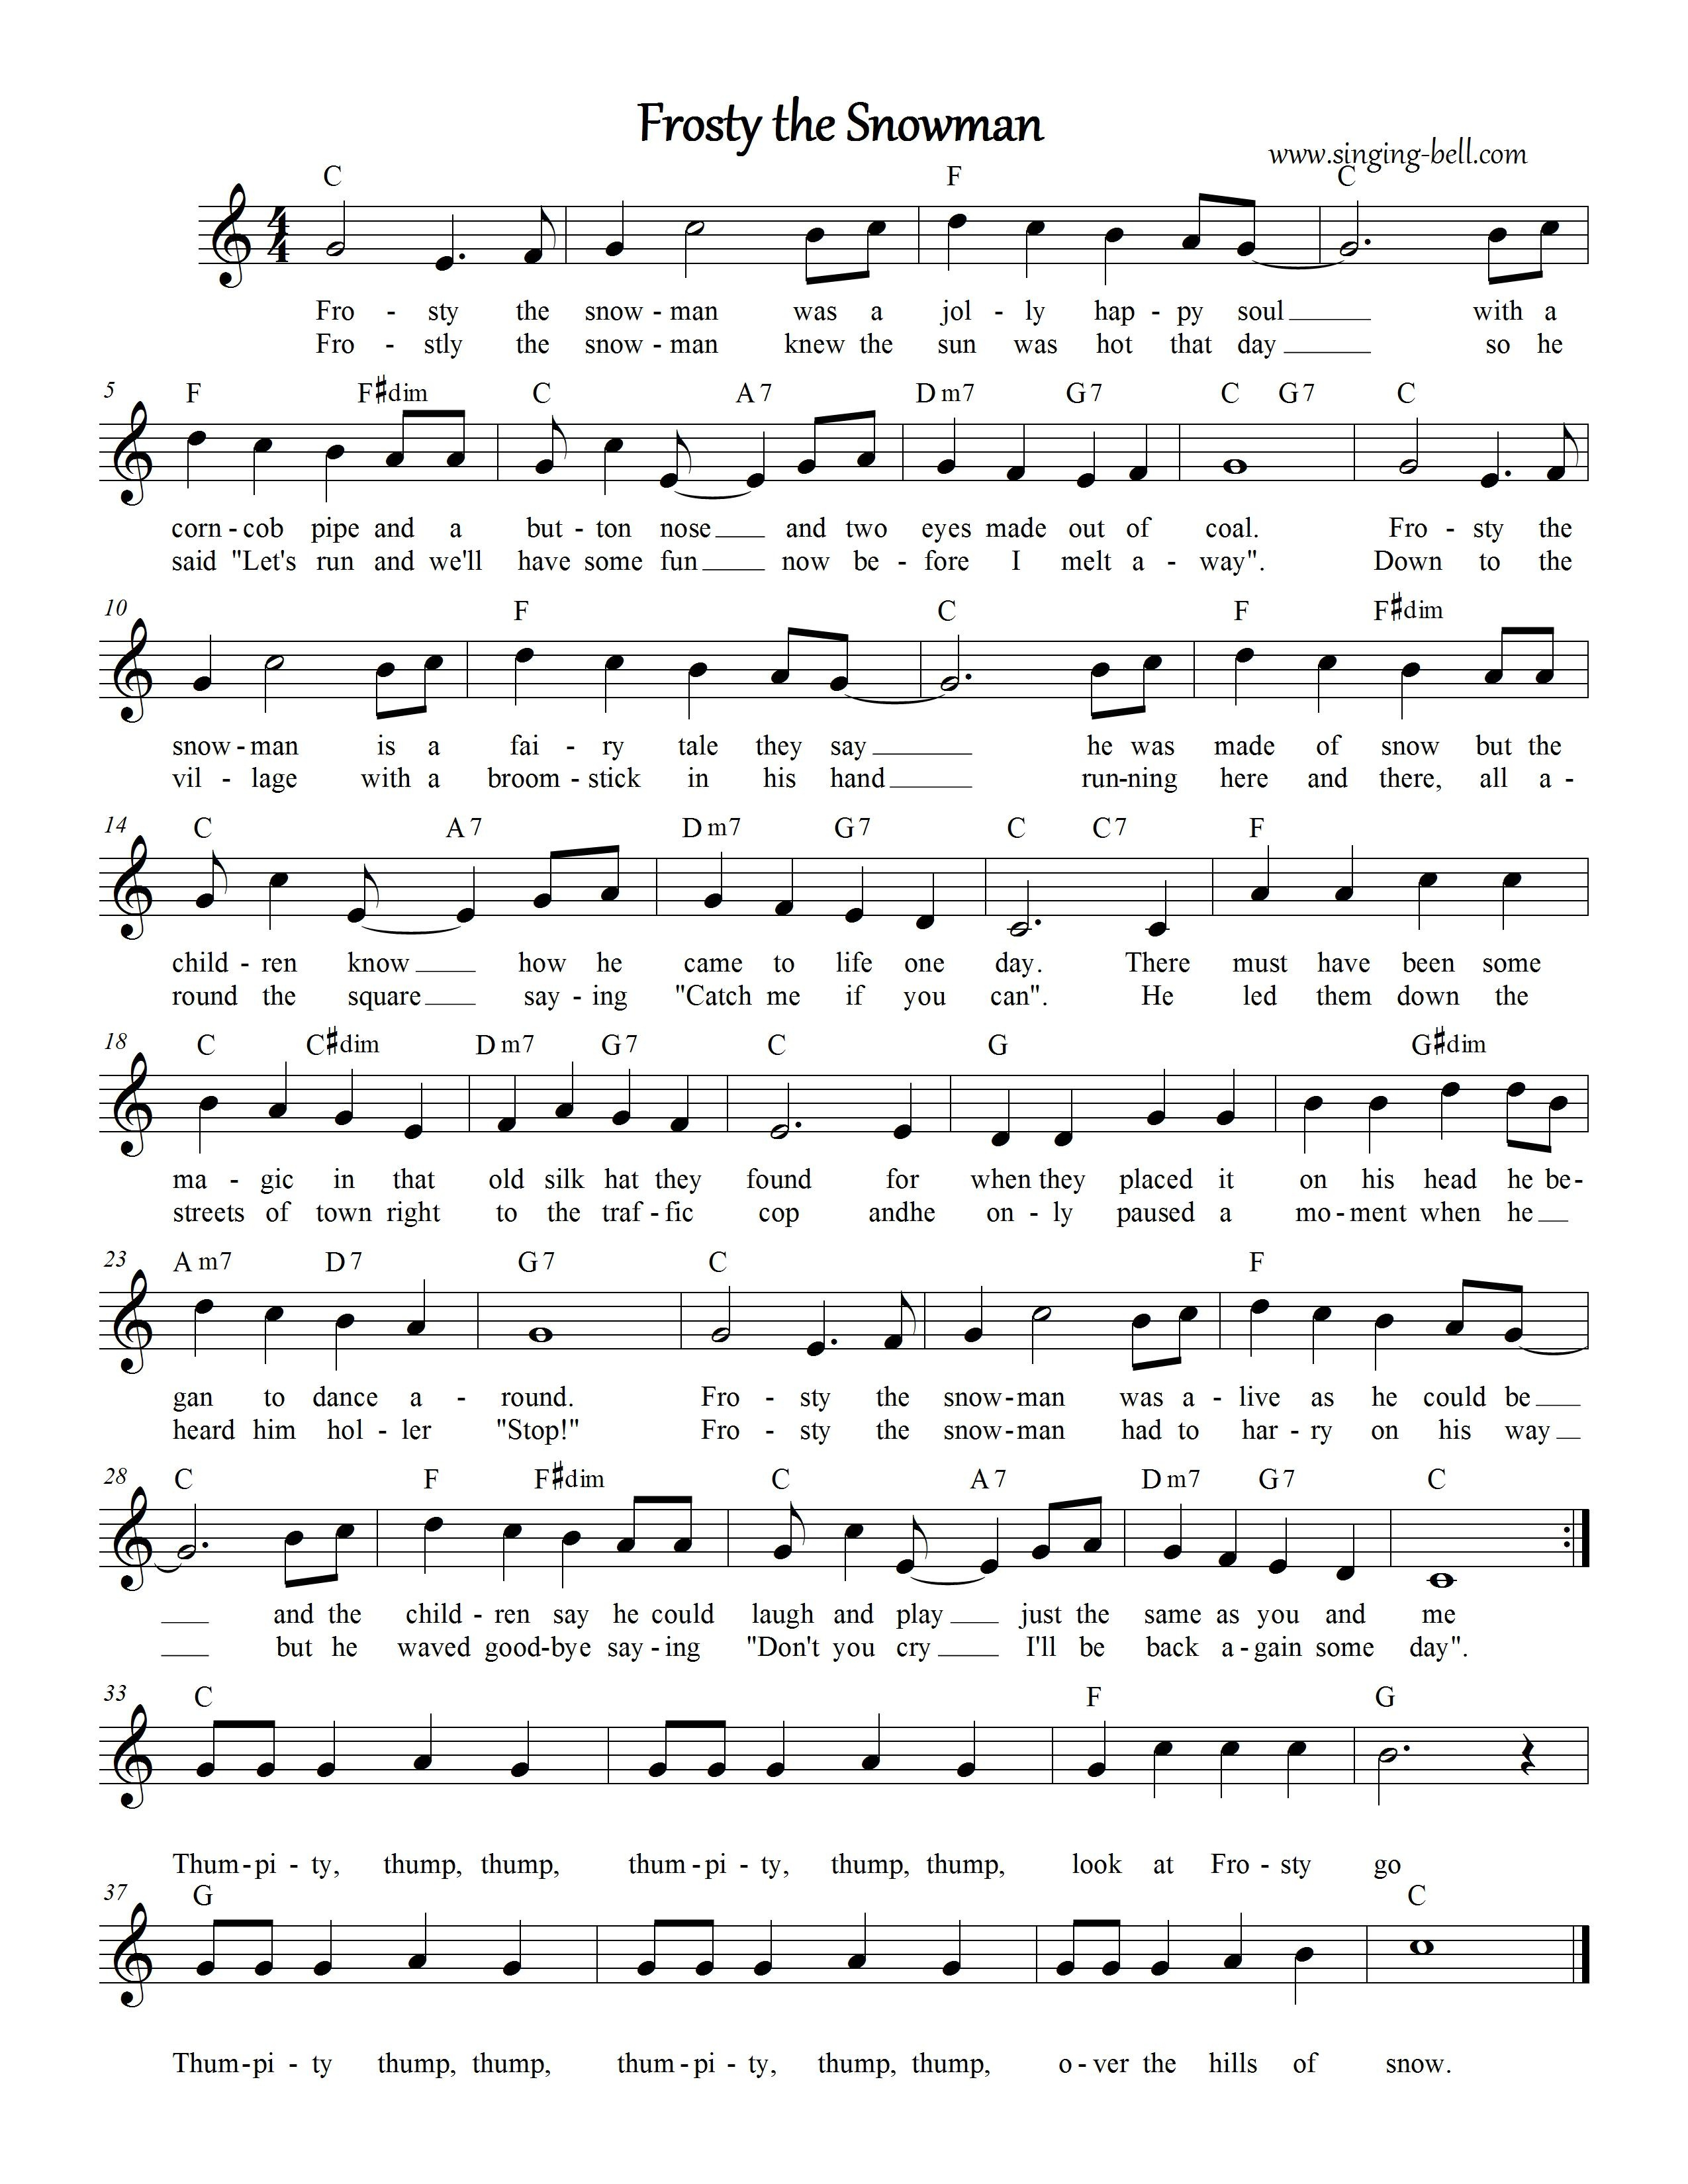 Frosty The Snowman | Free Christmas Carols Karaoke - Free Printable Frosty The Snowman Sheet Music